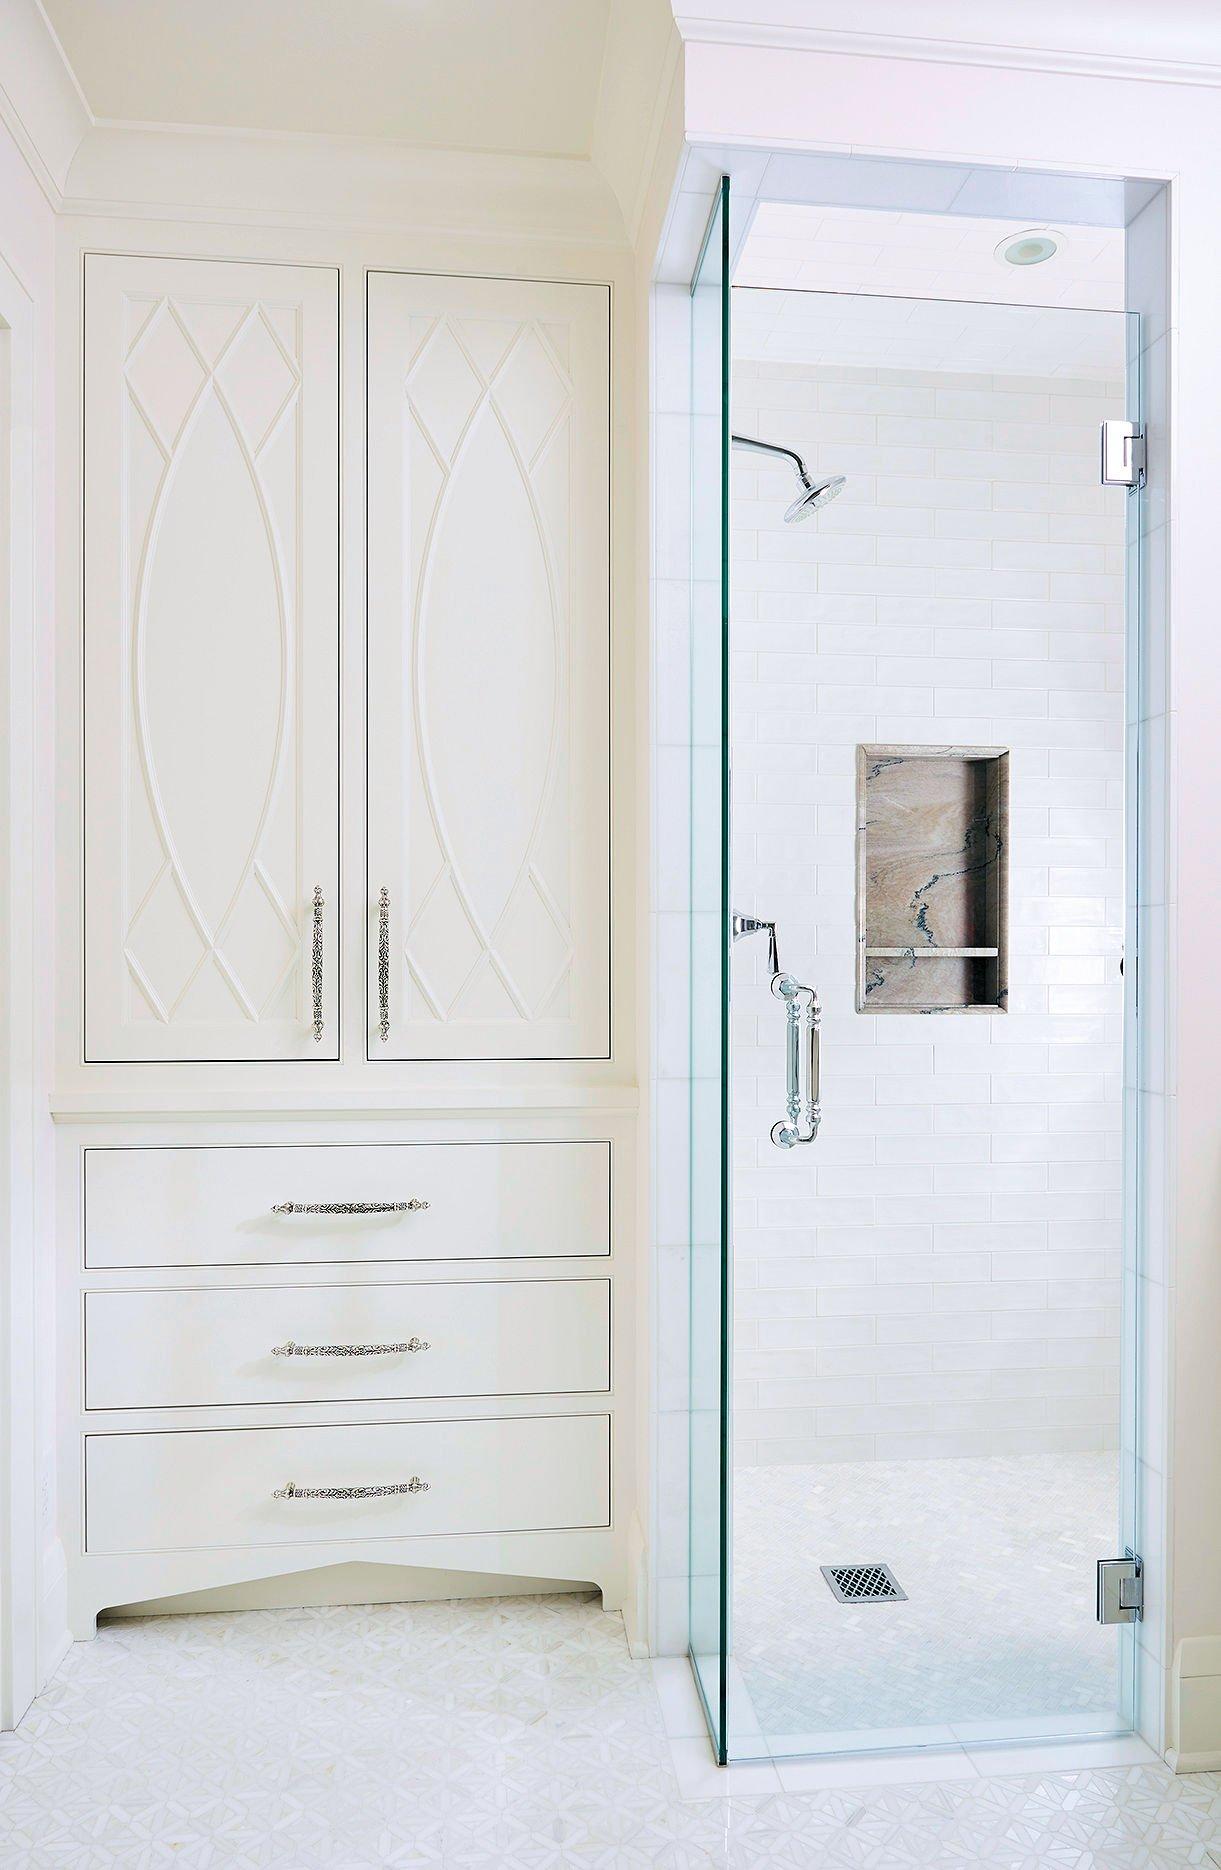 Regal Retreat shower detail by Sandy LaMendola of Twist Interior Design